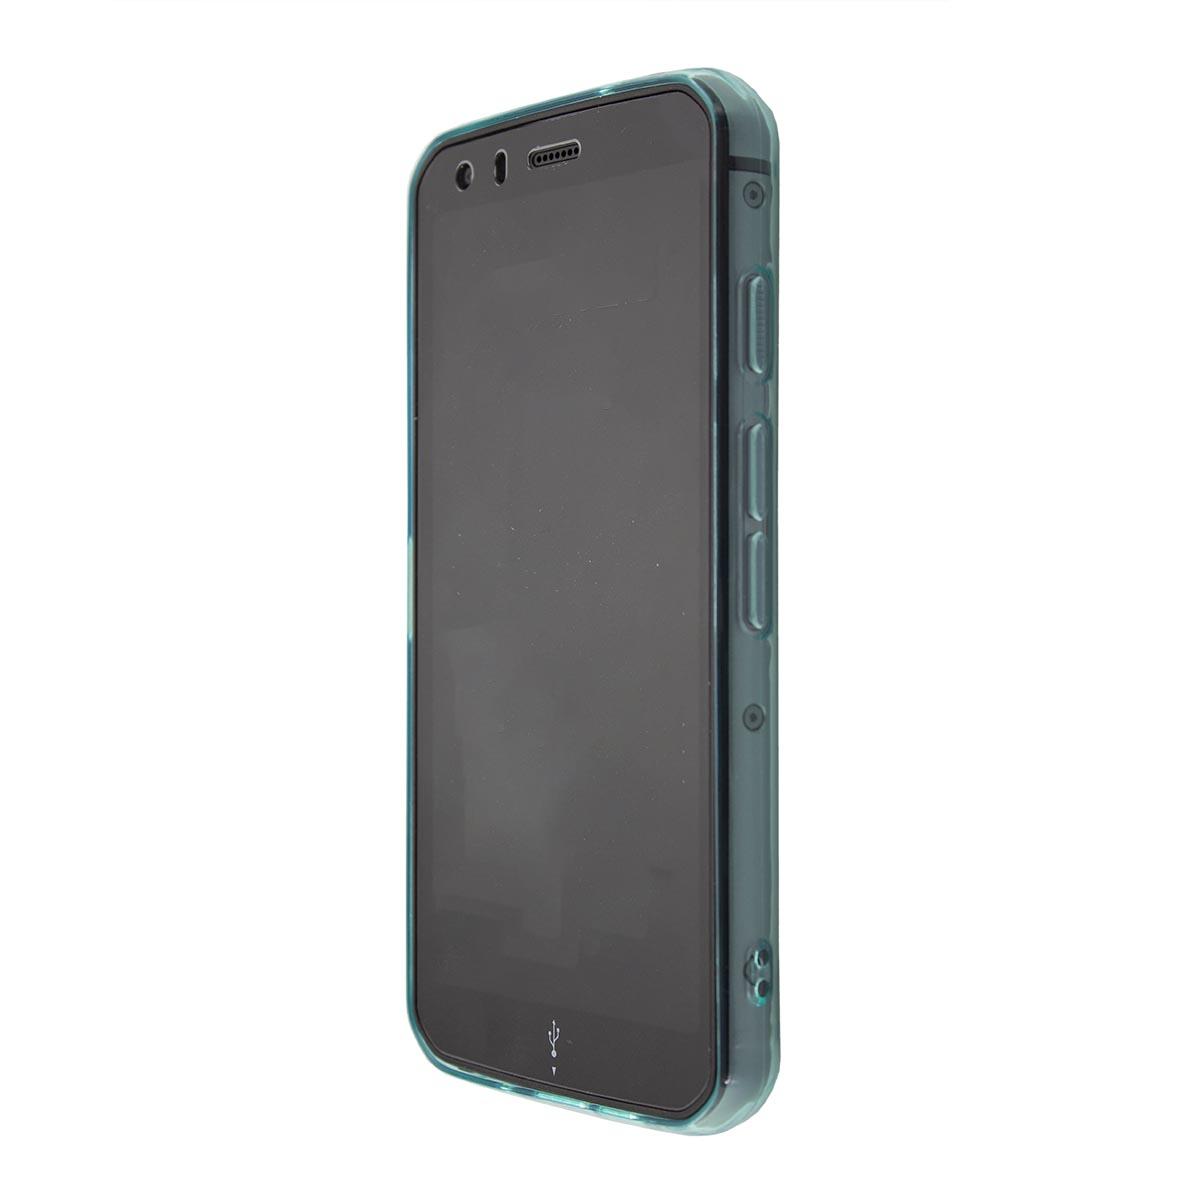 Caseroxx-TPU-Case-pour-Cat-S62-Pro-fait-de-TPU miniature 16